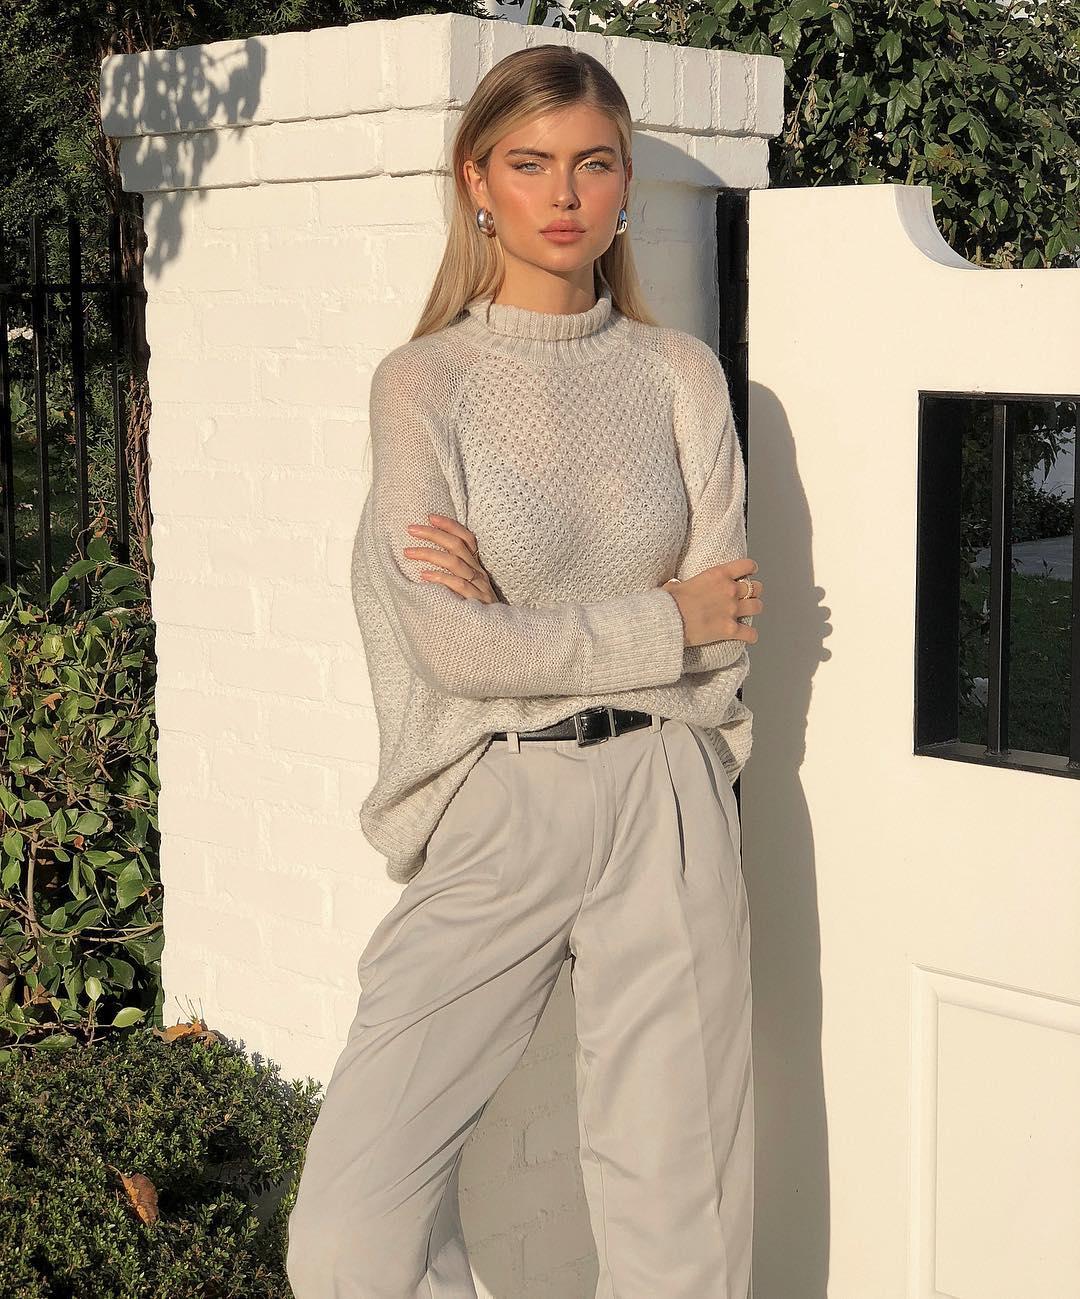 Kellie-Stewart-Wallpapers-Insta-Fit-Bio-1